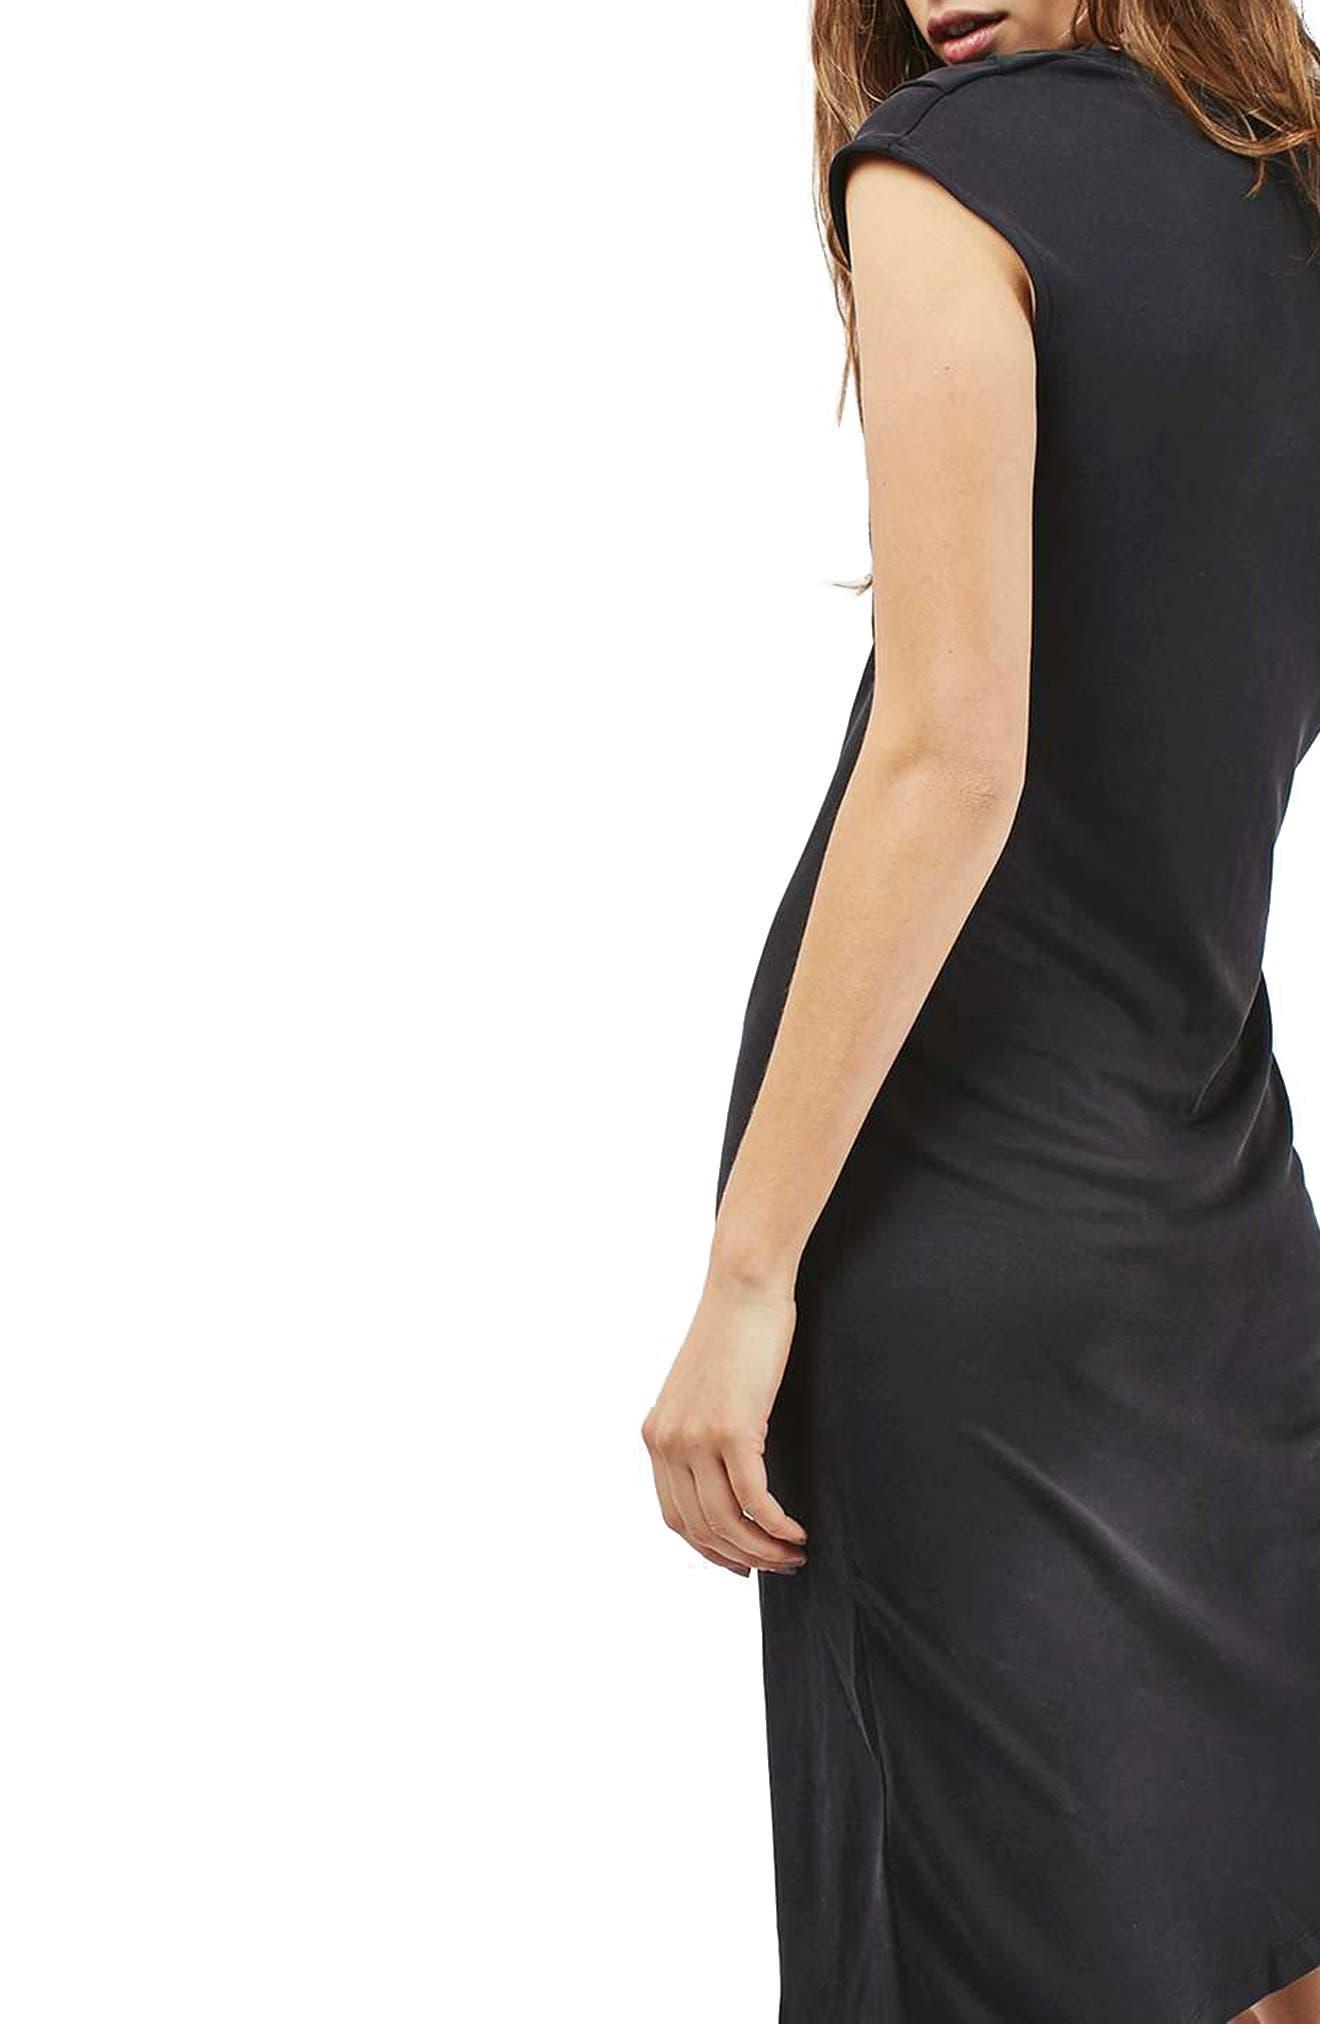 TOPSHOP Asymmetric Slinky Drape Dress, Main, color, 001